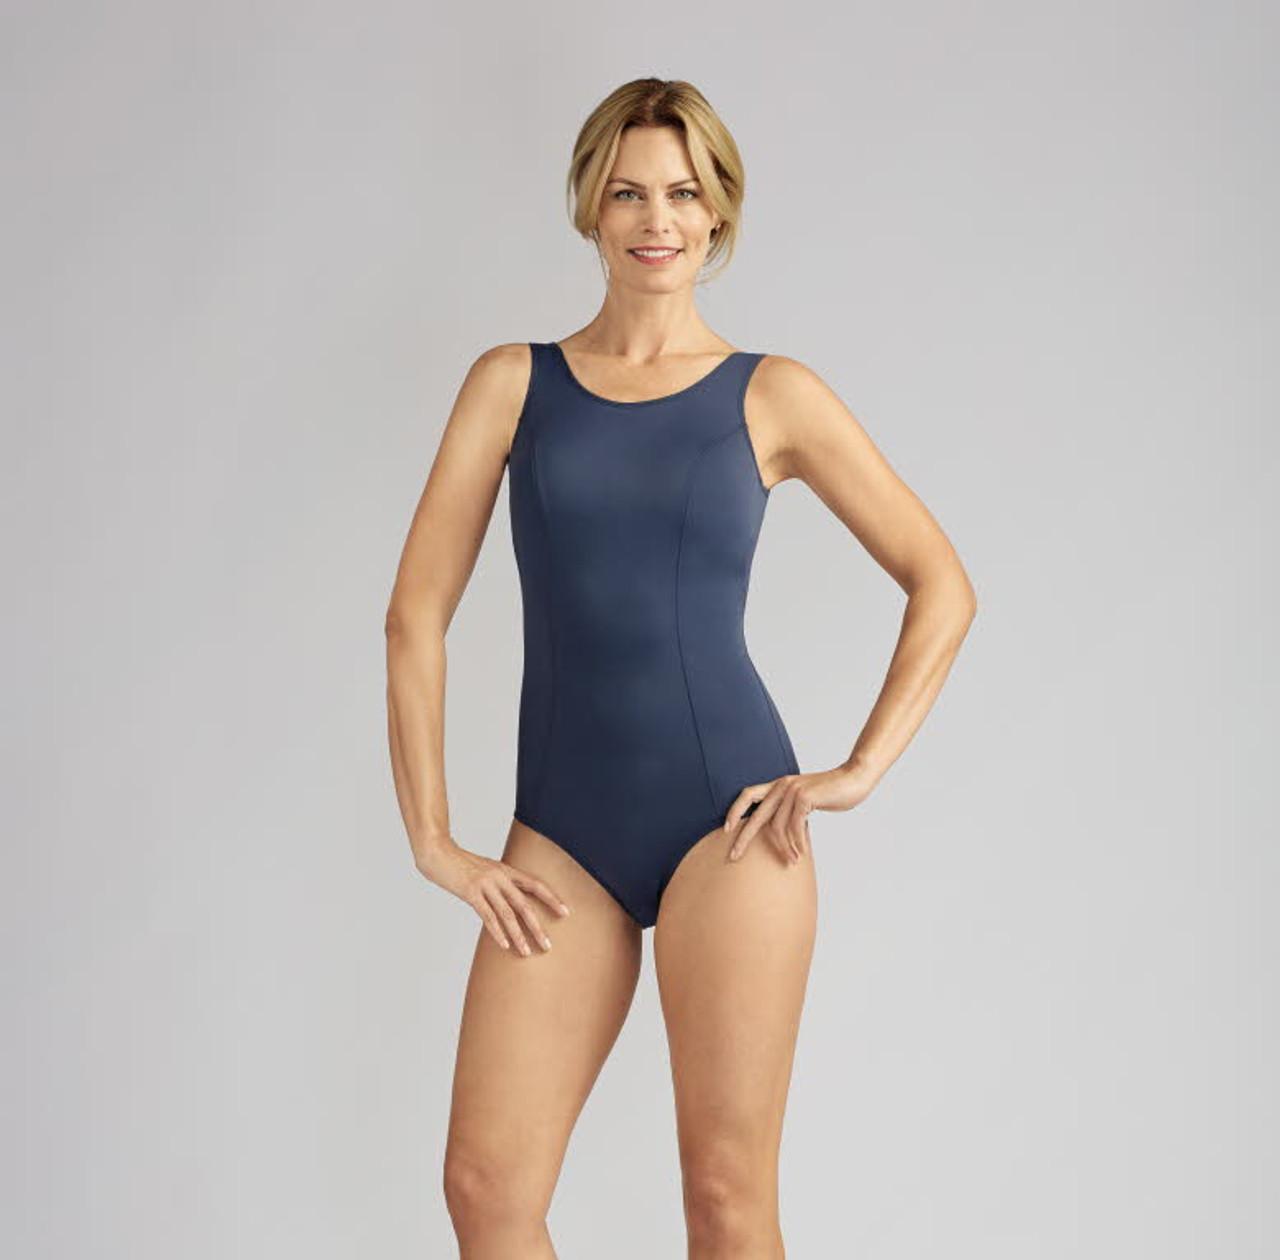 e03aaad3b00c6 Amoena 70842 70654 Rhodes One-Piece Mastectomy Swimsuit ...